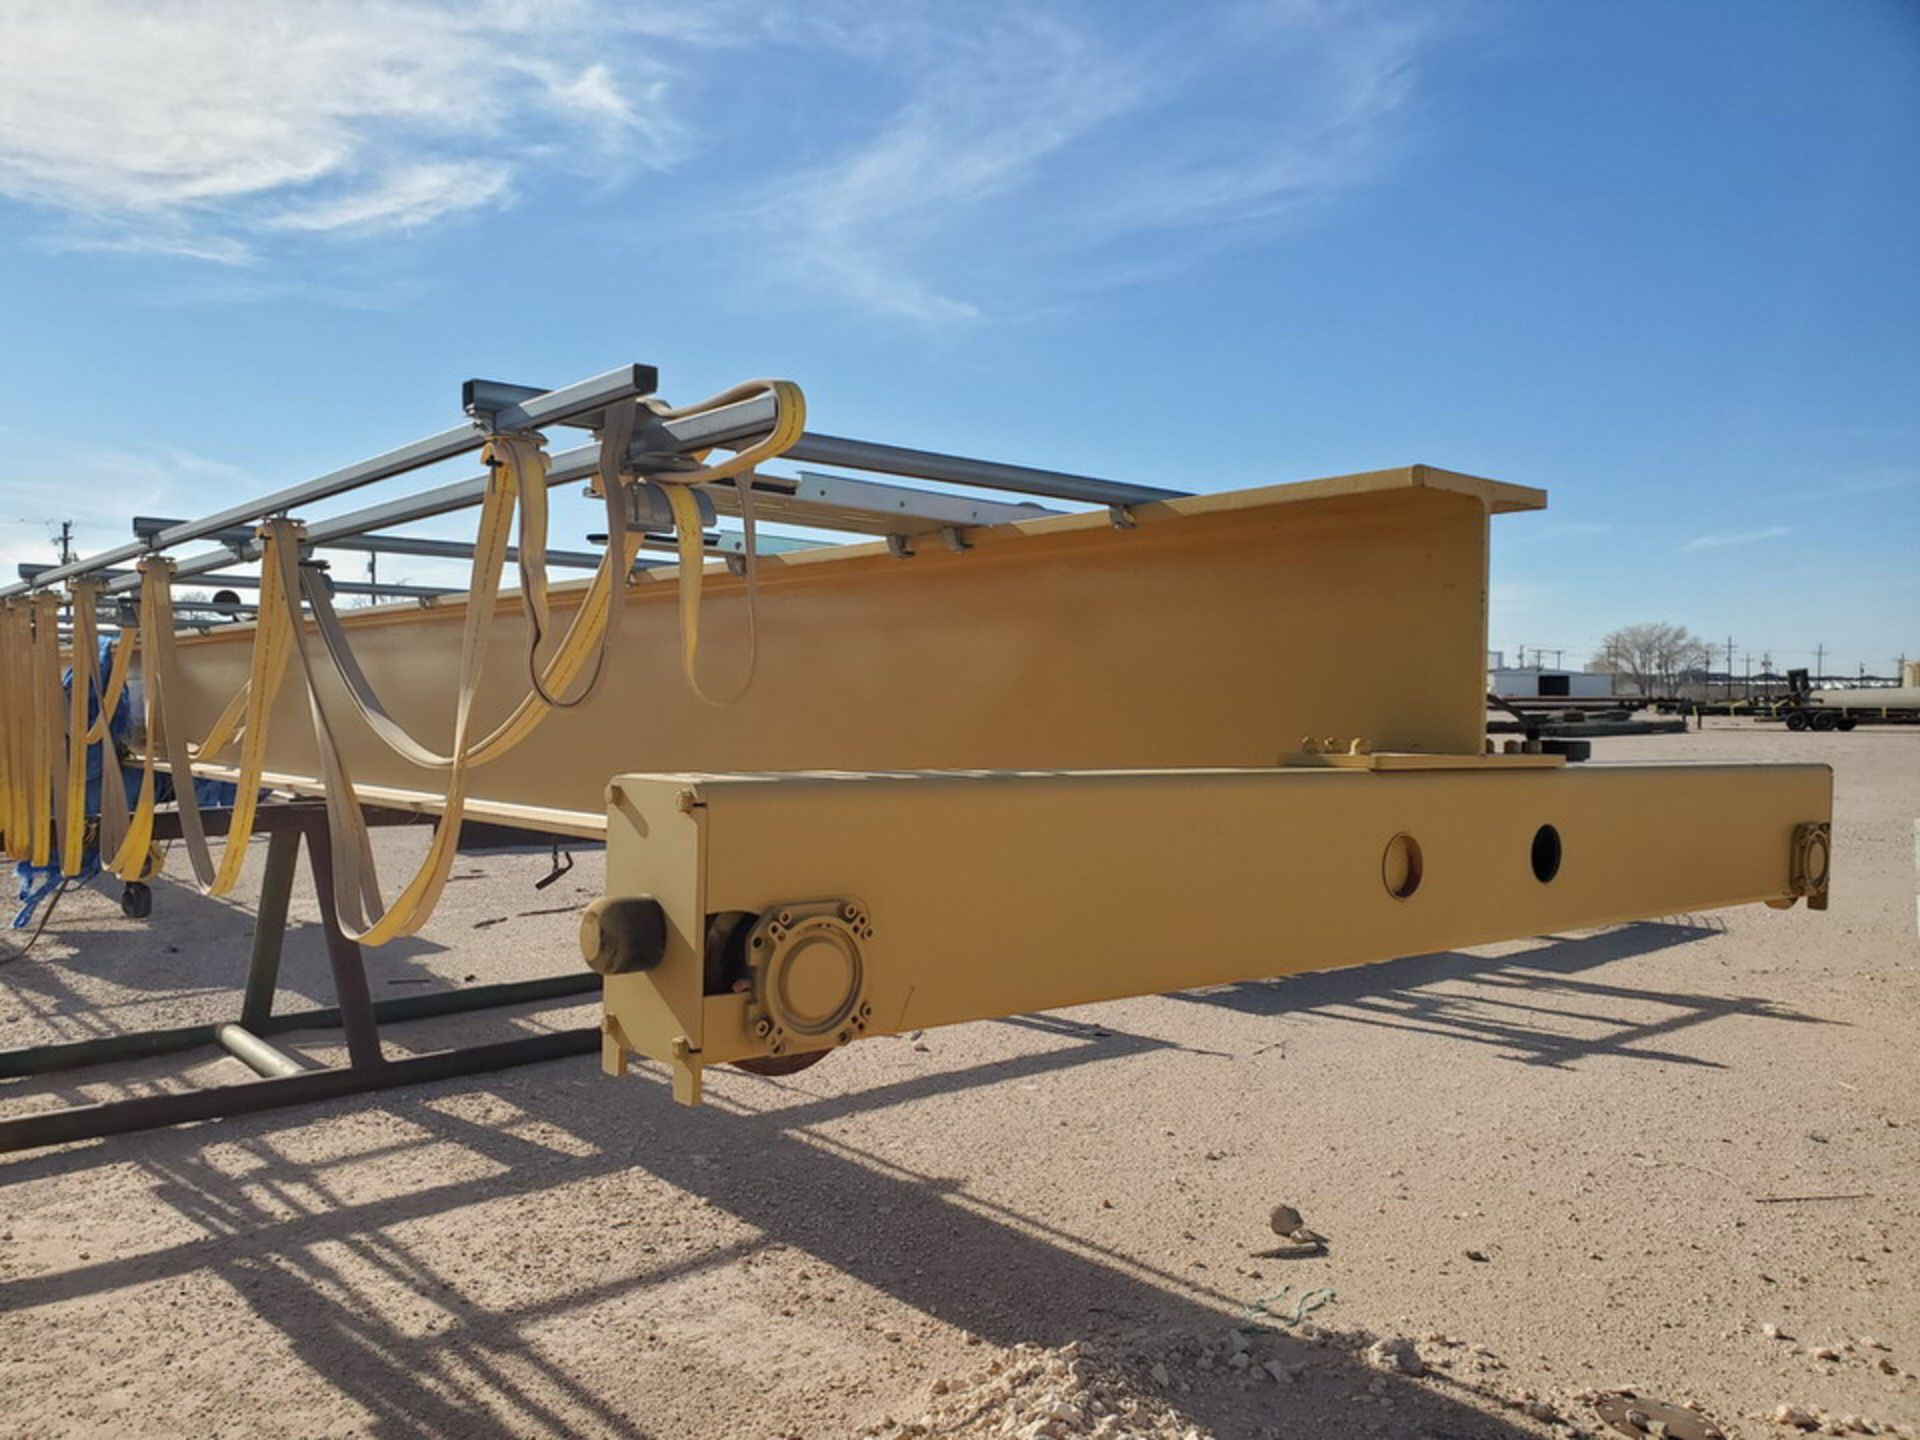 R & M 10 Ton Top Riding Bridge Crane Approx. 66' x 10'L - Image 26 of 39